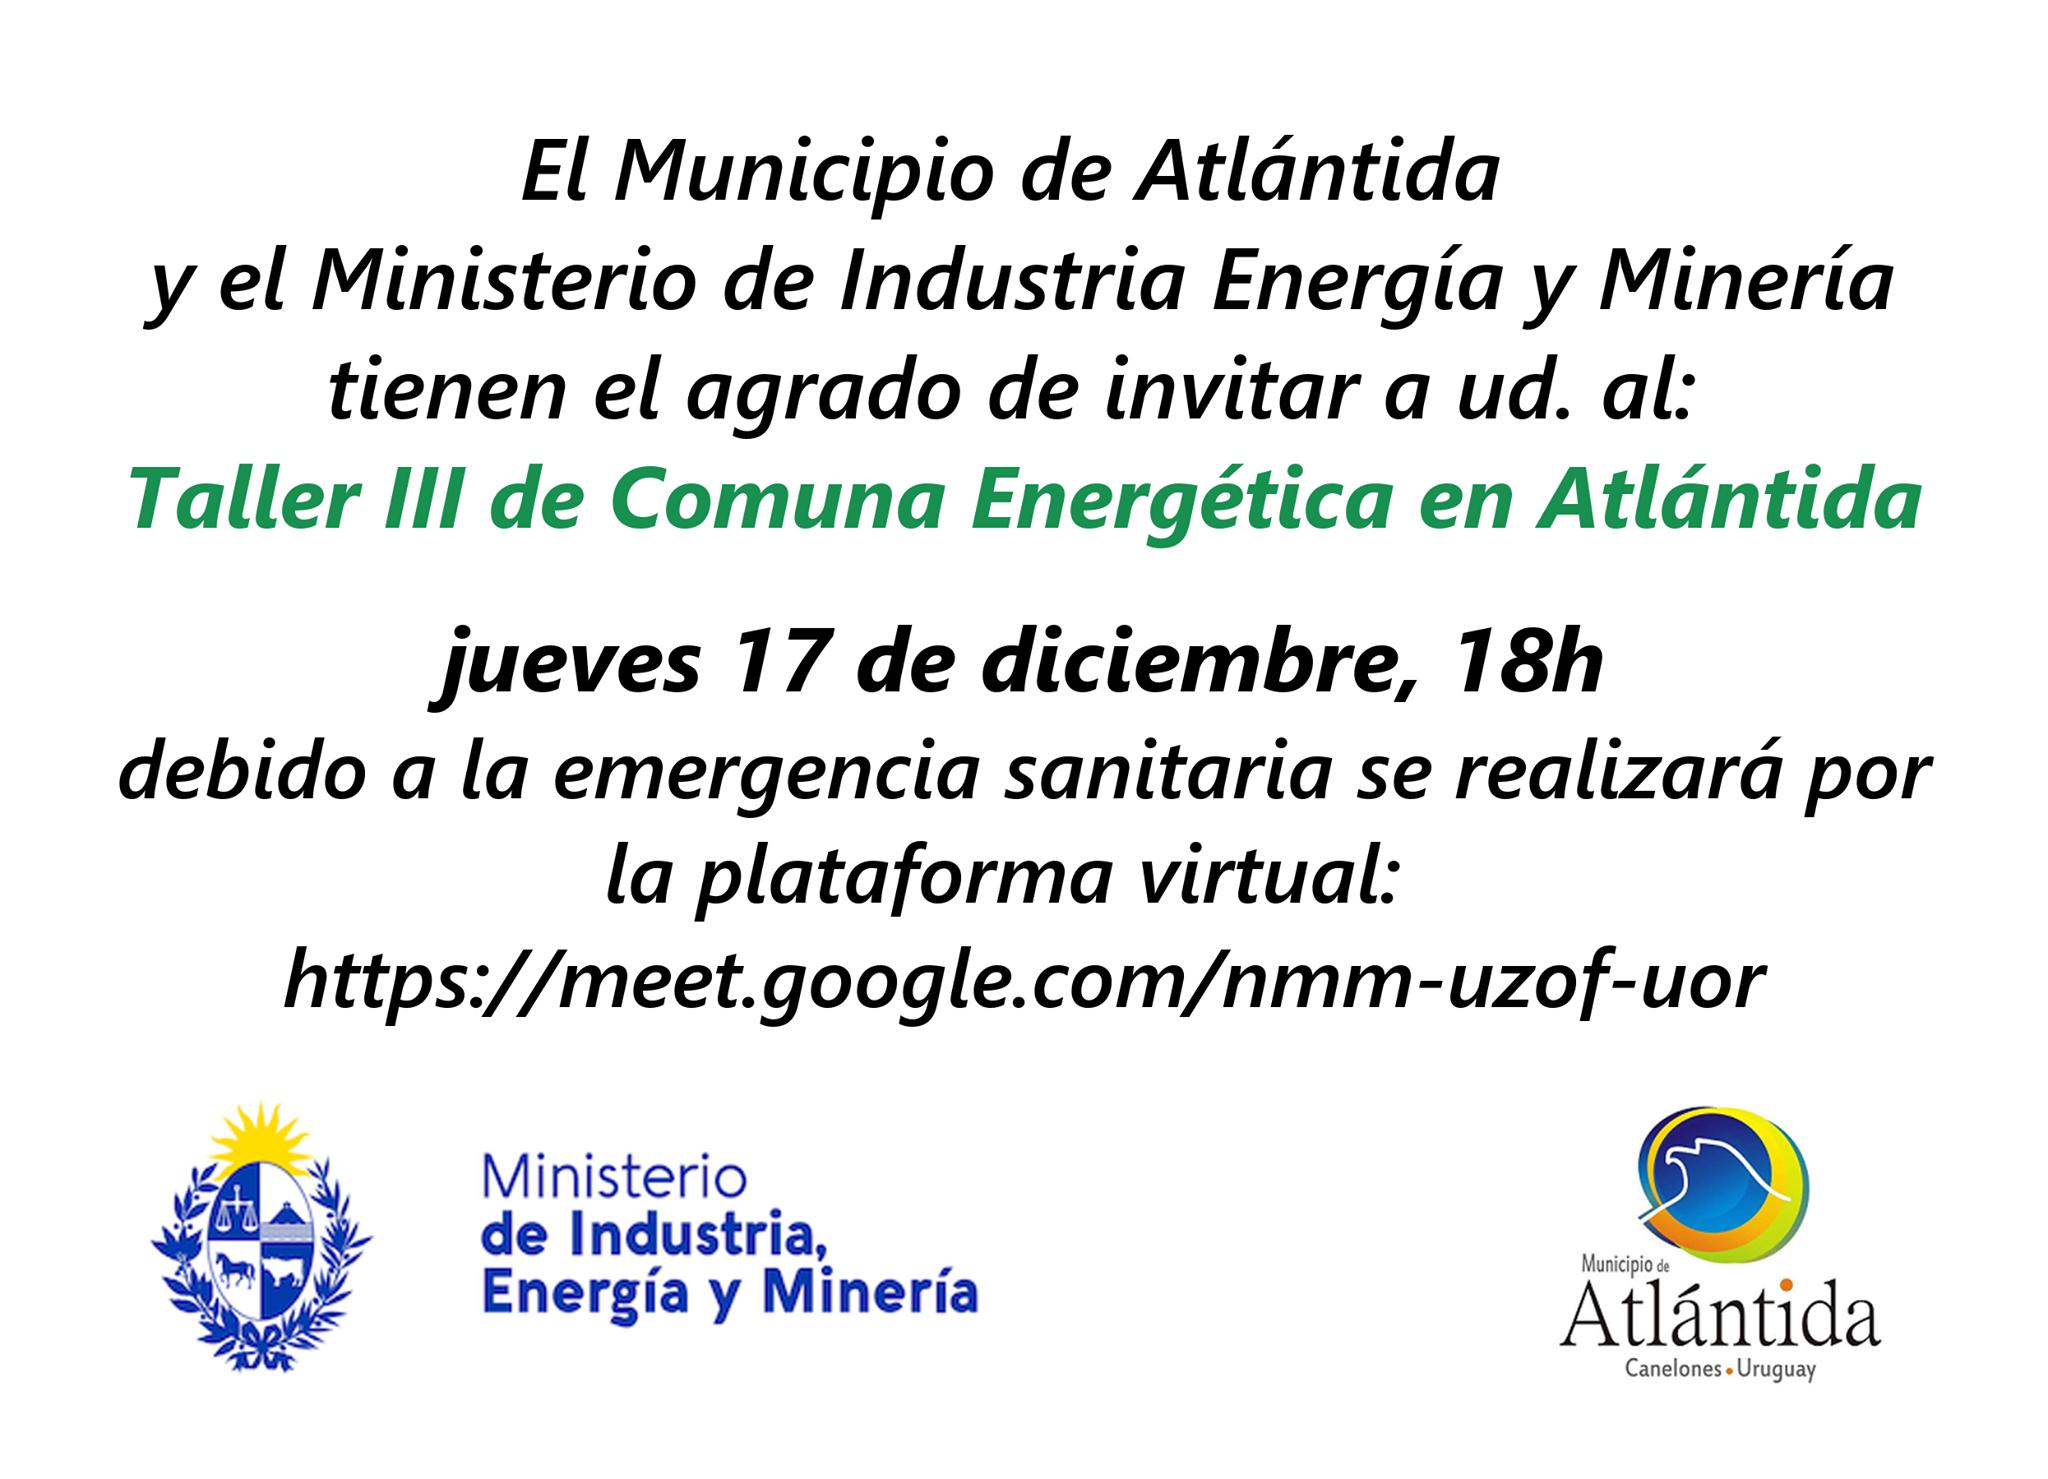 Taller de COMUNA ENERGÉTICA III en Atlántida